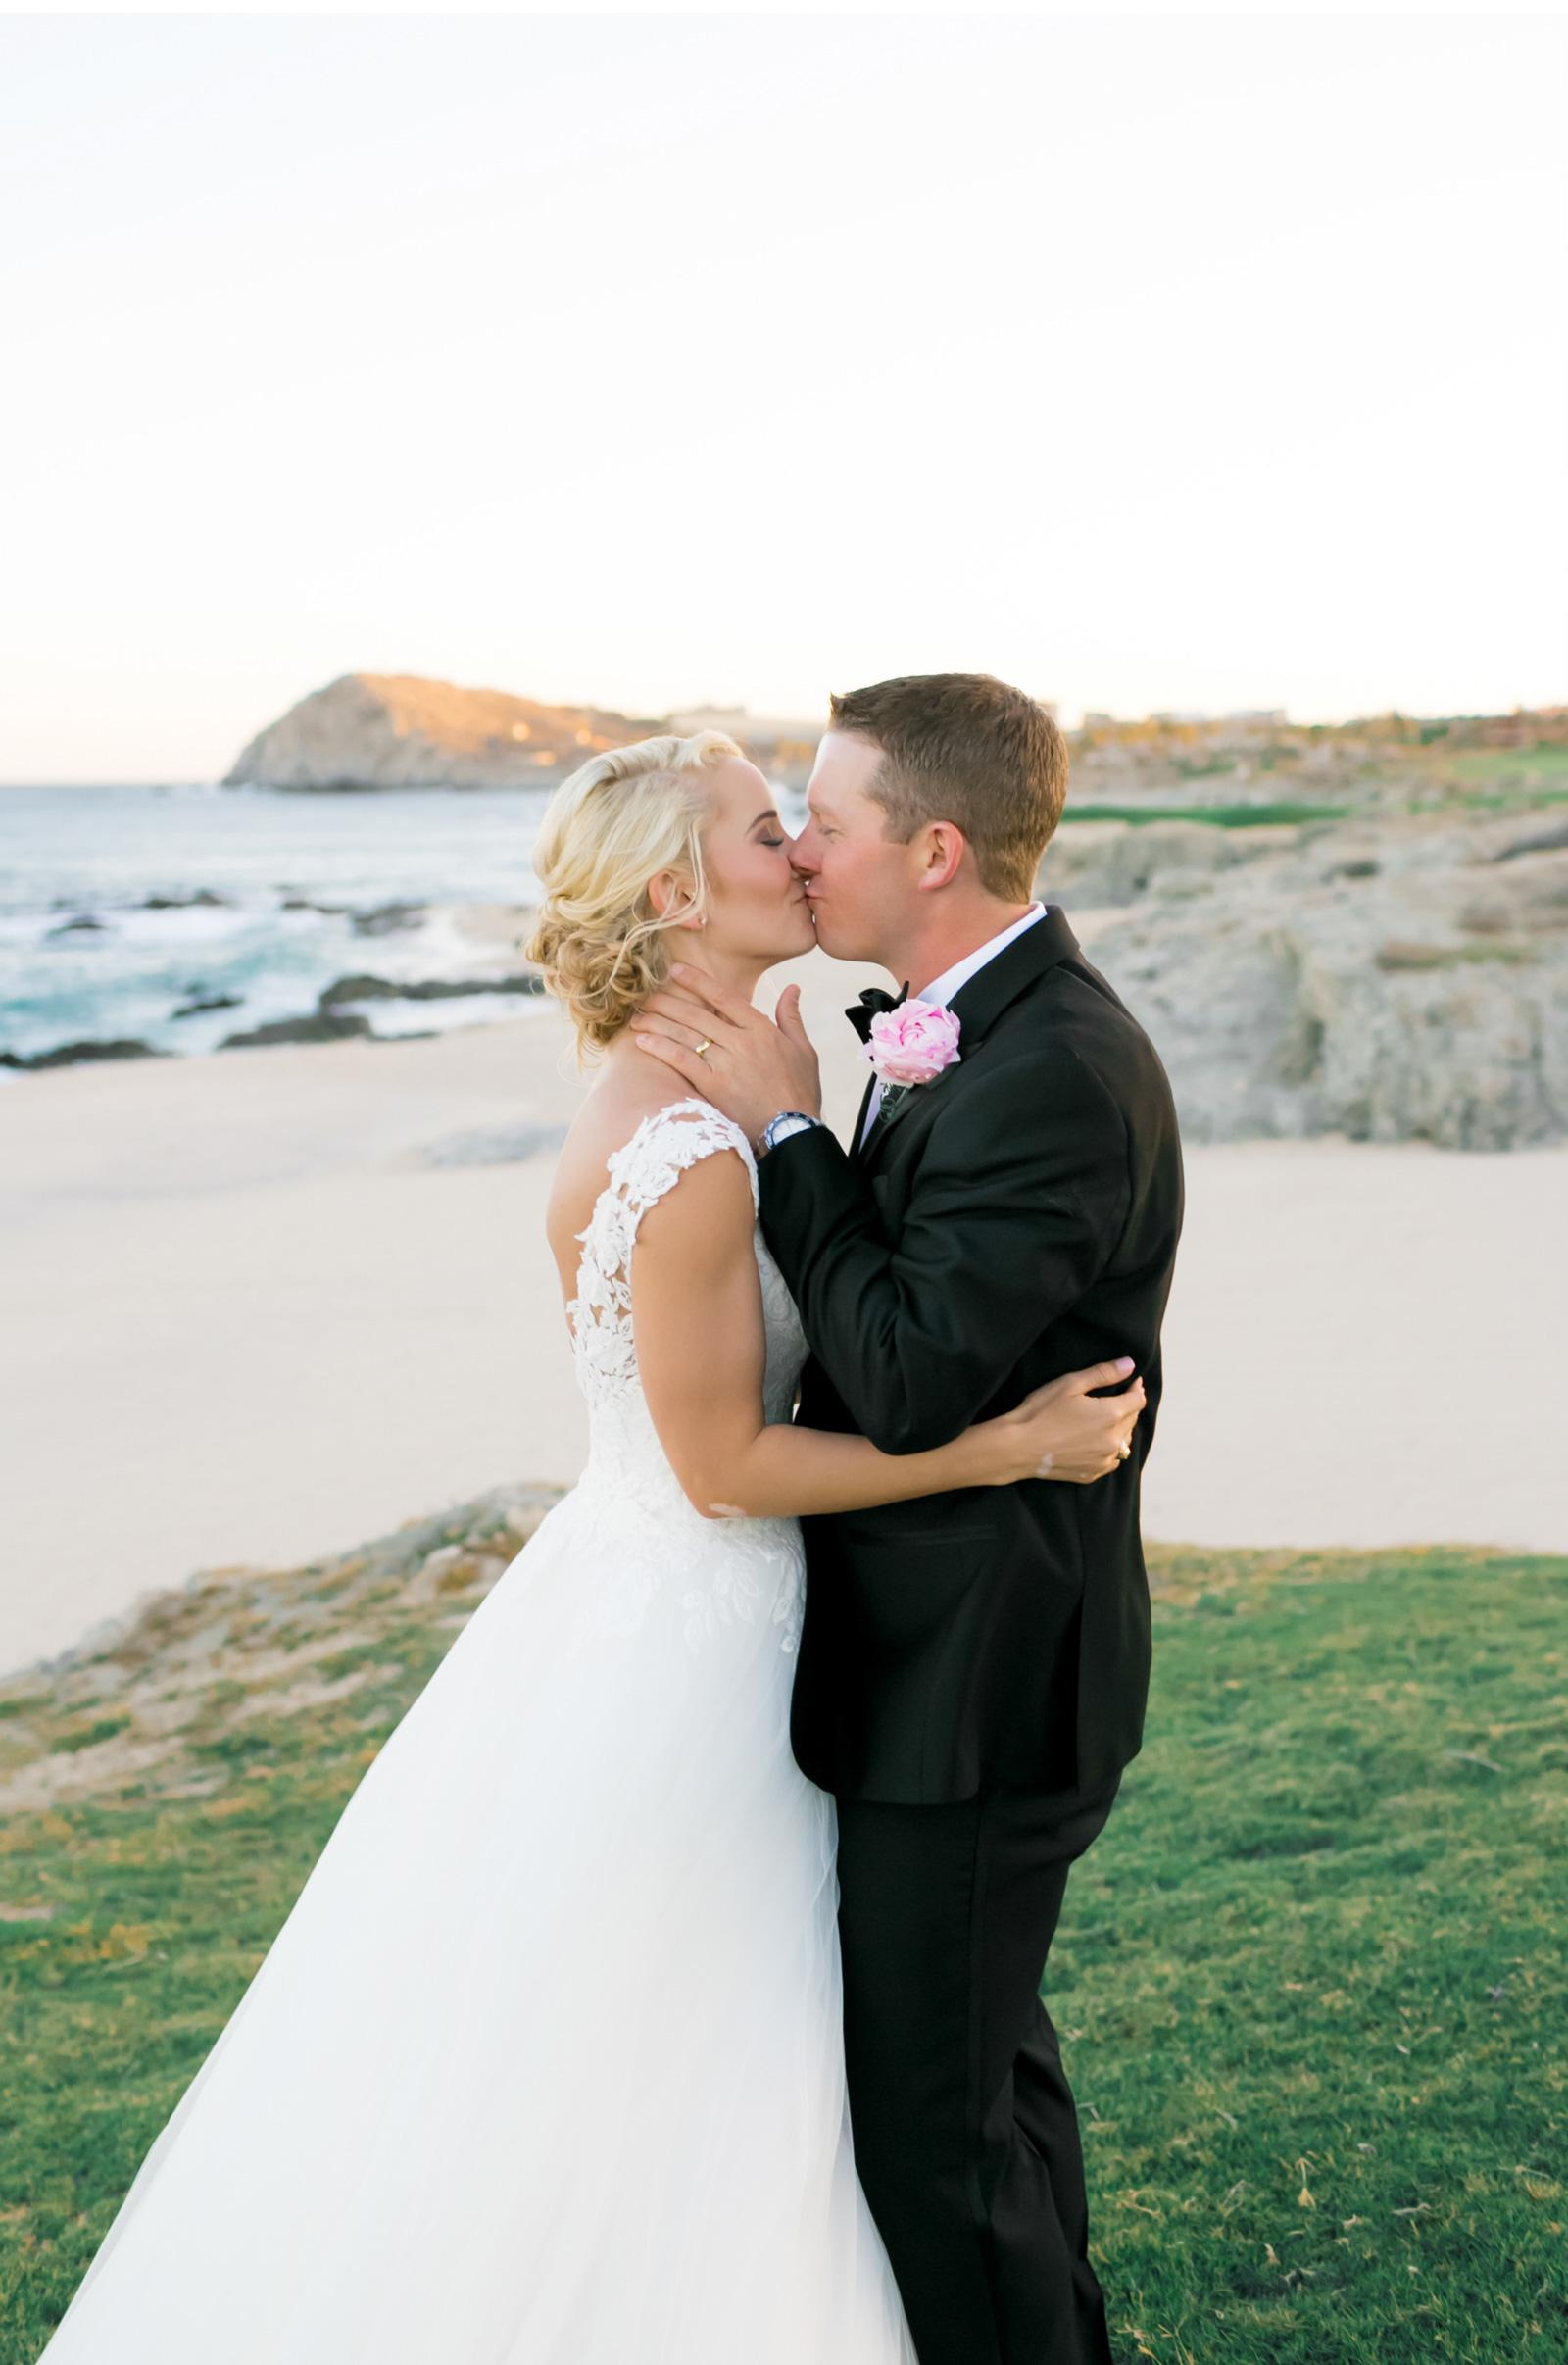 Hawaii-Destination-Wedding-Natalie-Schutt-Photography-Style-Me-Pretty_11.jpg